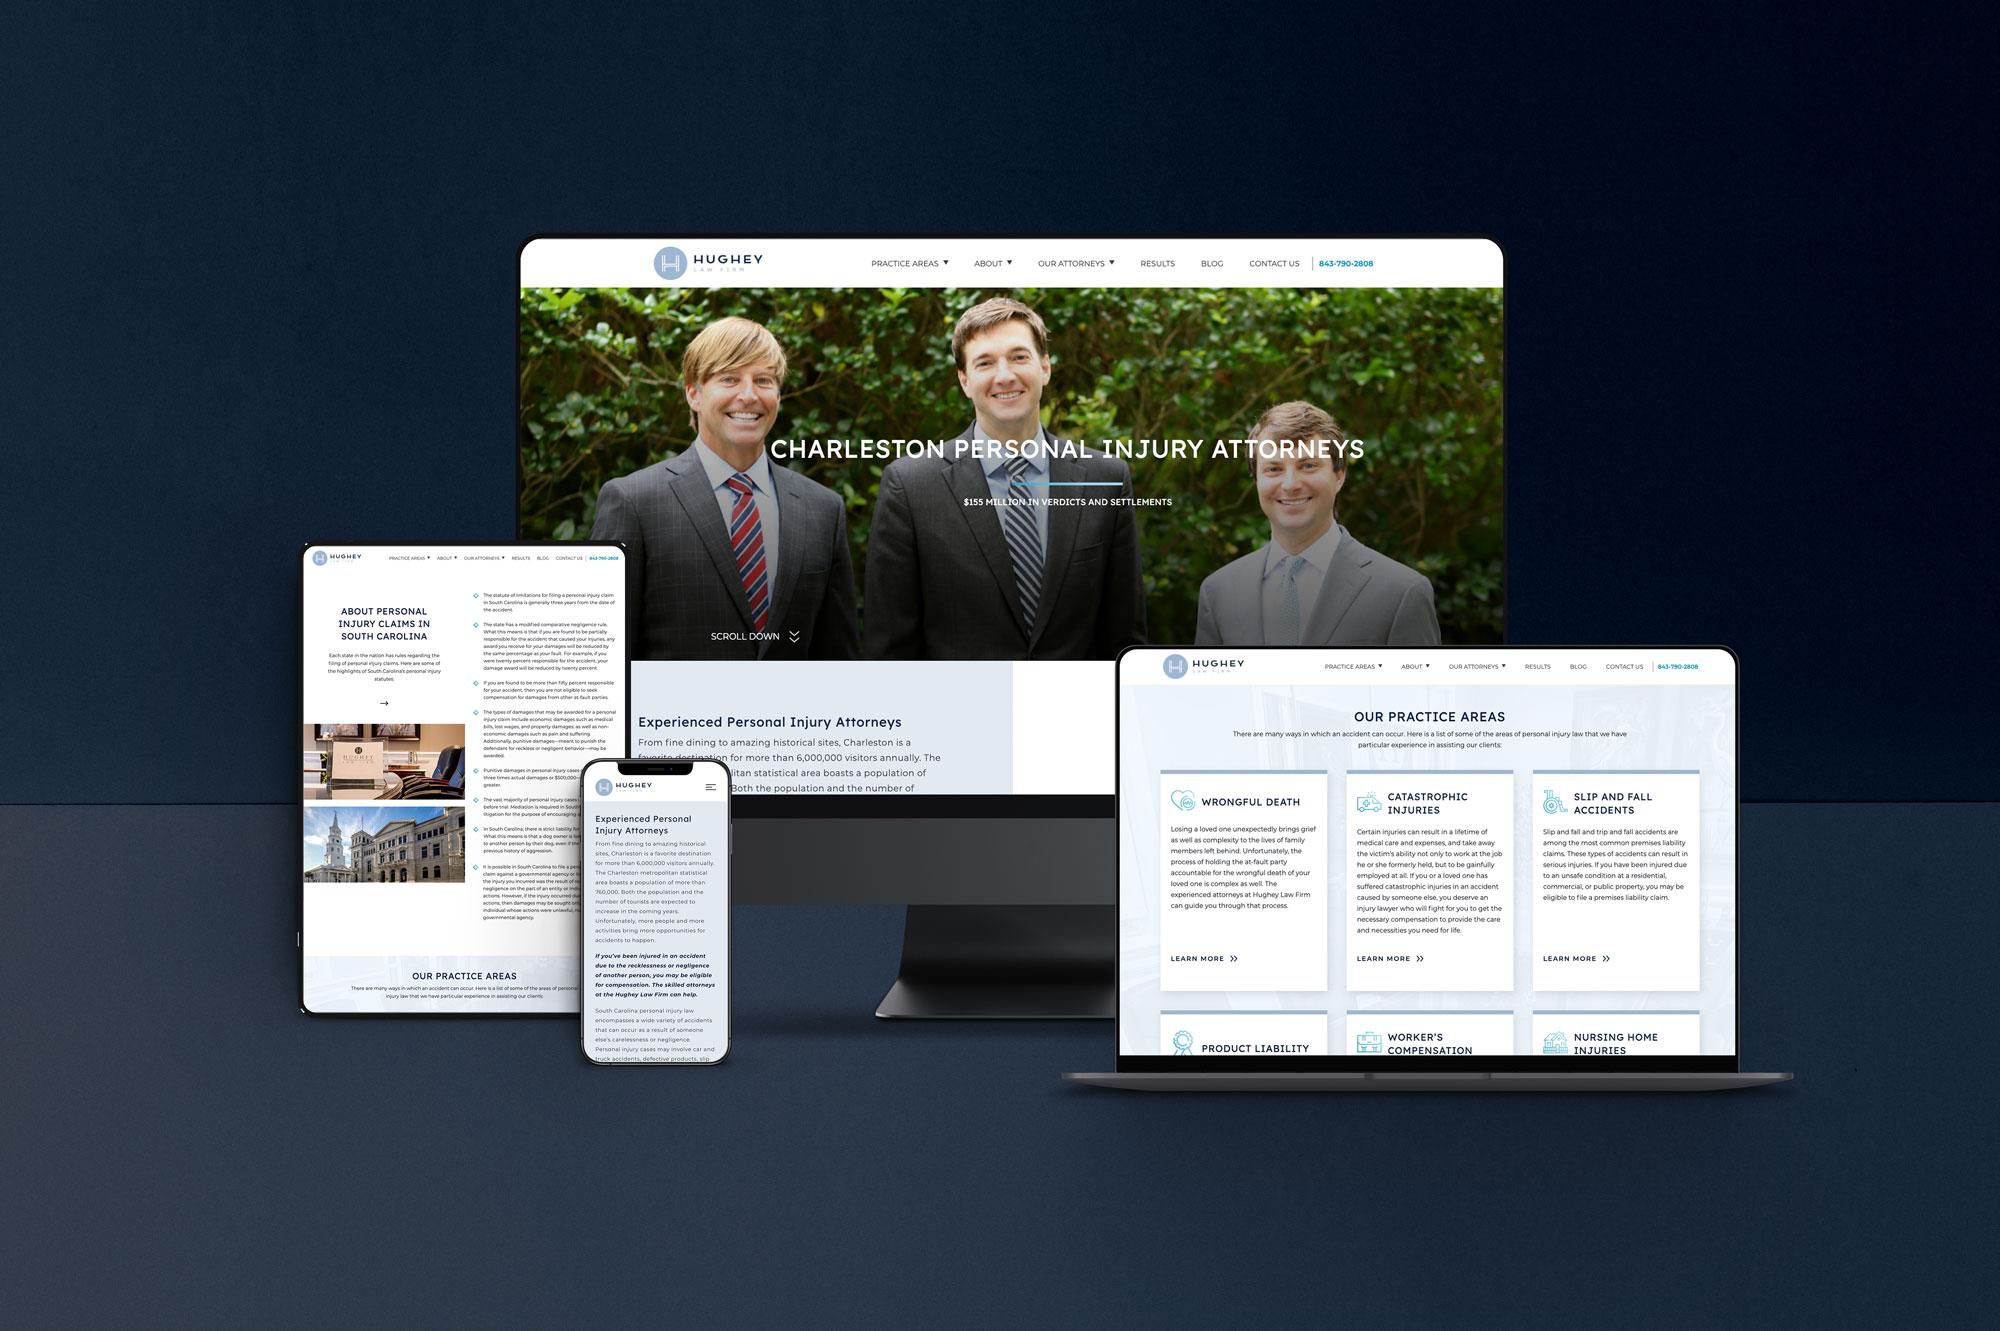 Hughey website on multiple devices